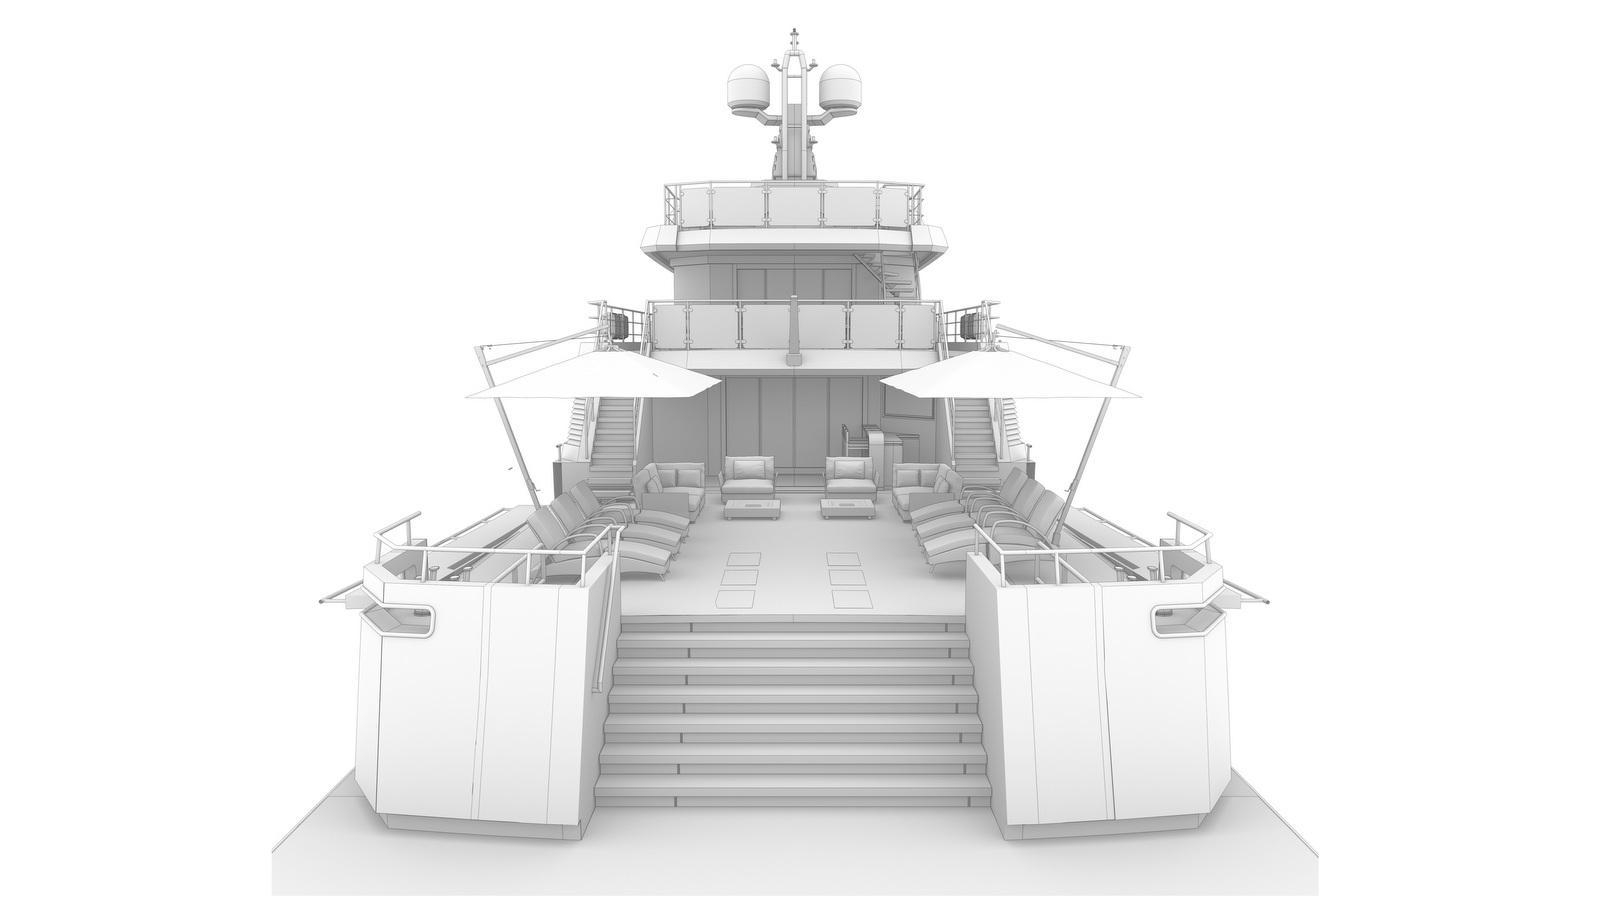 aurelia 29 motoryacht cantiere delle marche 40m 2020 rendering stern